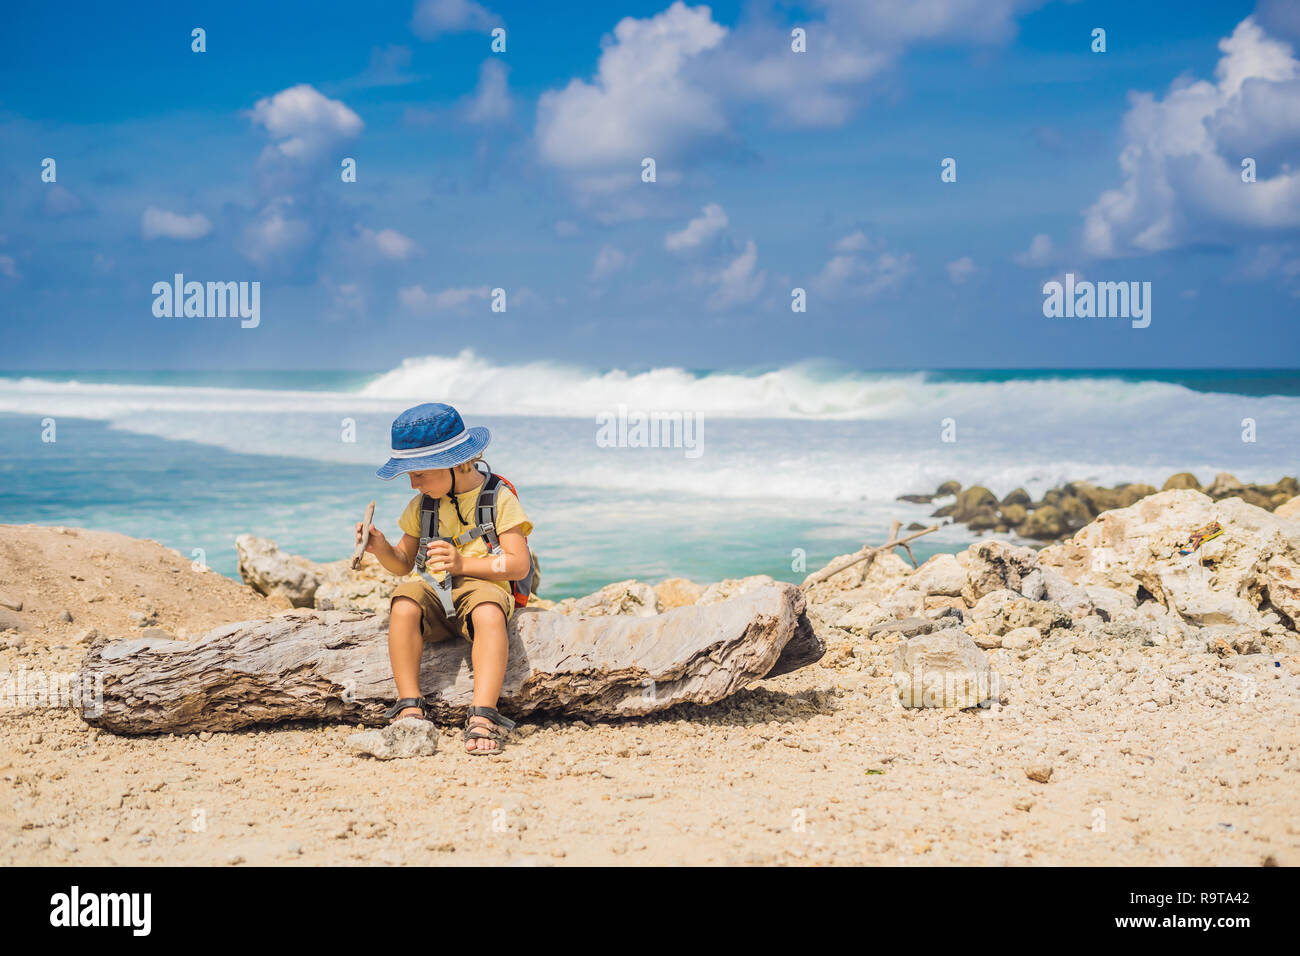 Boy Traveler On Amazing Melasti Beach With Turquoise Water Bali